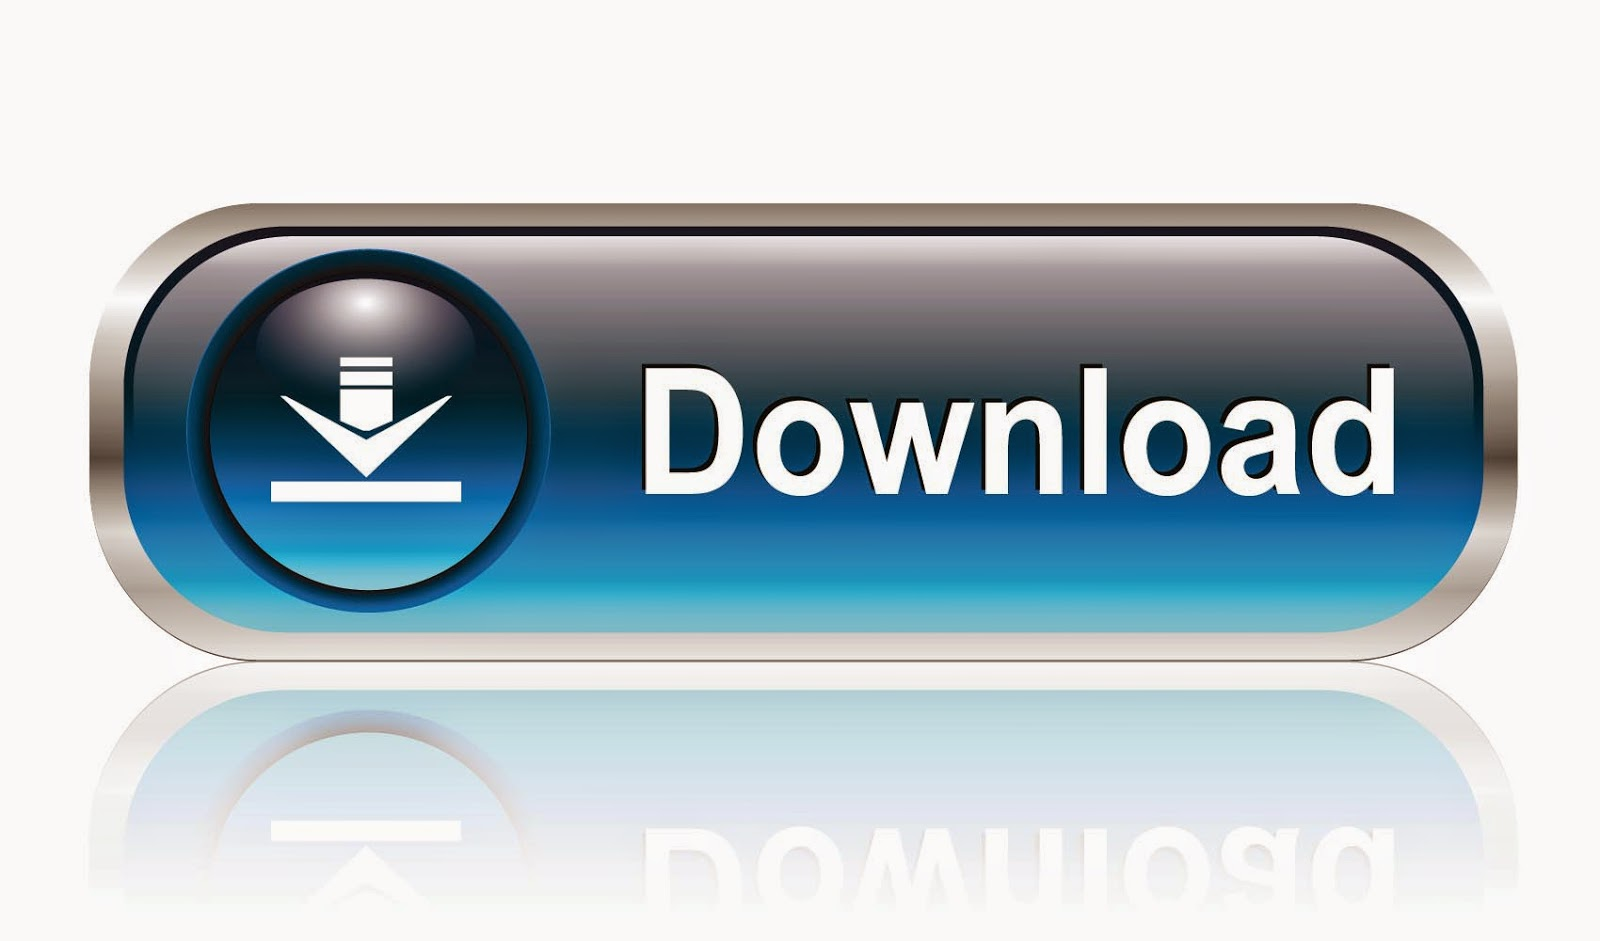 "<img src=""http://4.bp.blogspot.com/-TlG0YgK3UEo/U1FZ6nkeNrI/AAAAAAAACXI/y7AmG4RktGM/s1600/sketchup.png"" alt=""SketchUp 8.0 Free Download"" />"